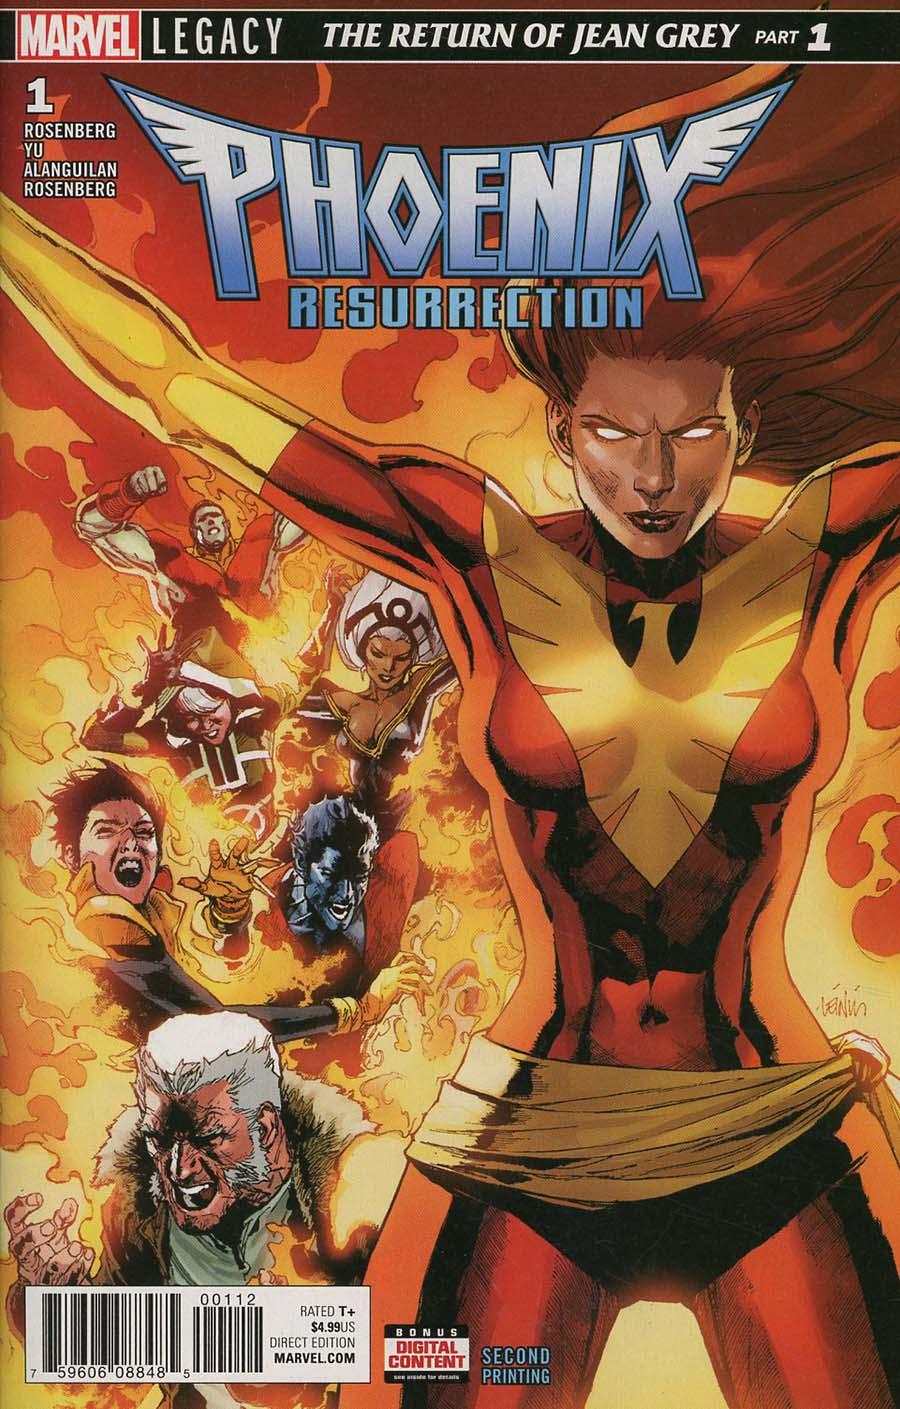 Phoenix Resurrection Return Of (Adult) Jean Grey #1 Cover V 2nd Ptg Variant Leinil Francis Yu Cover